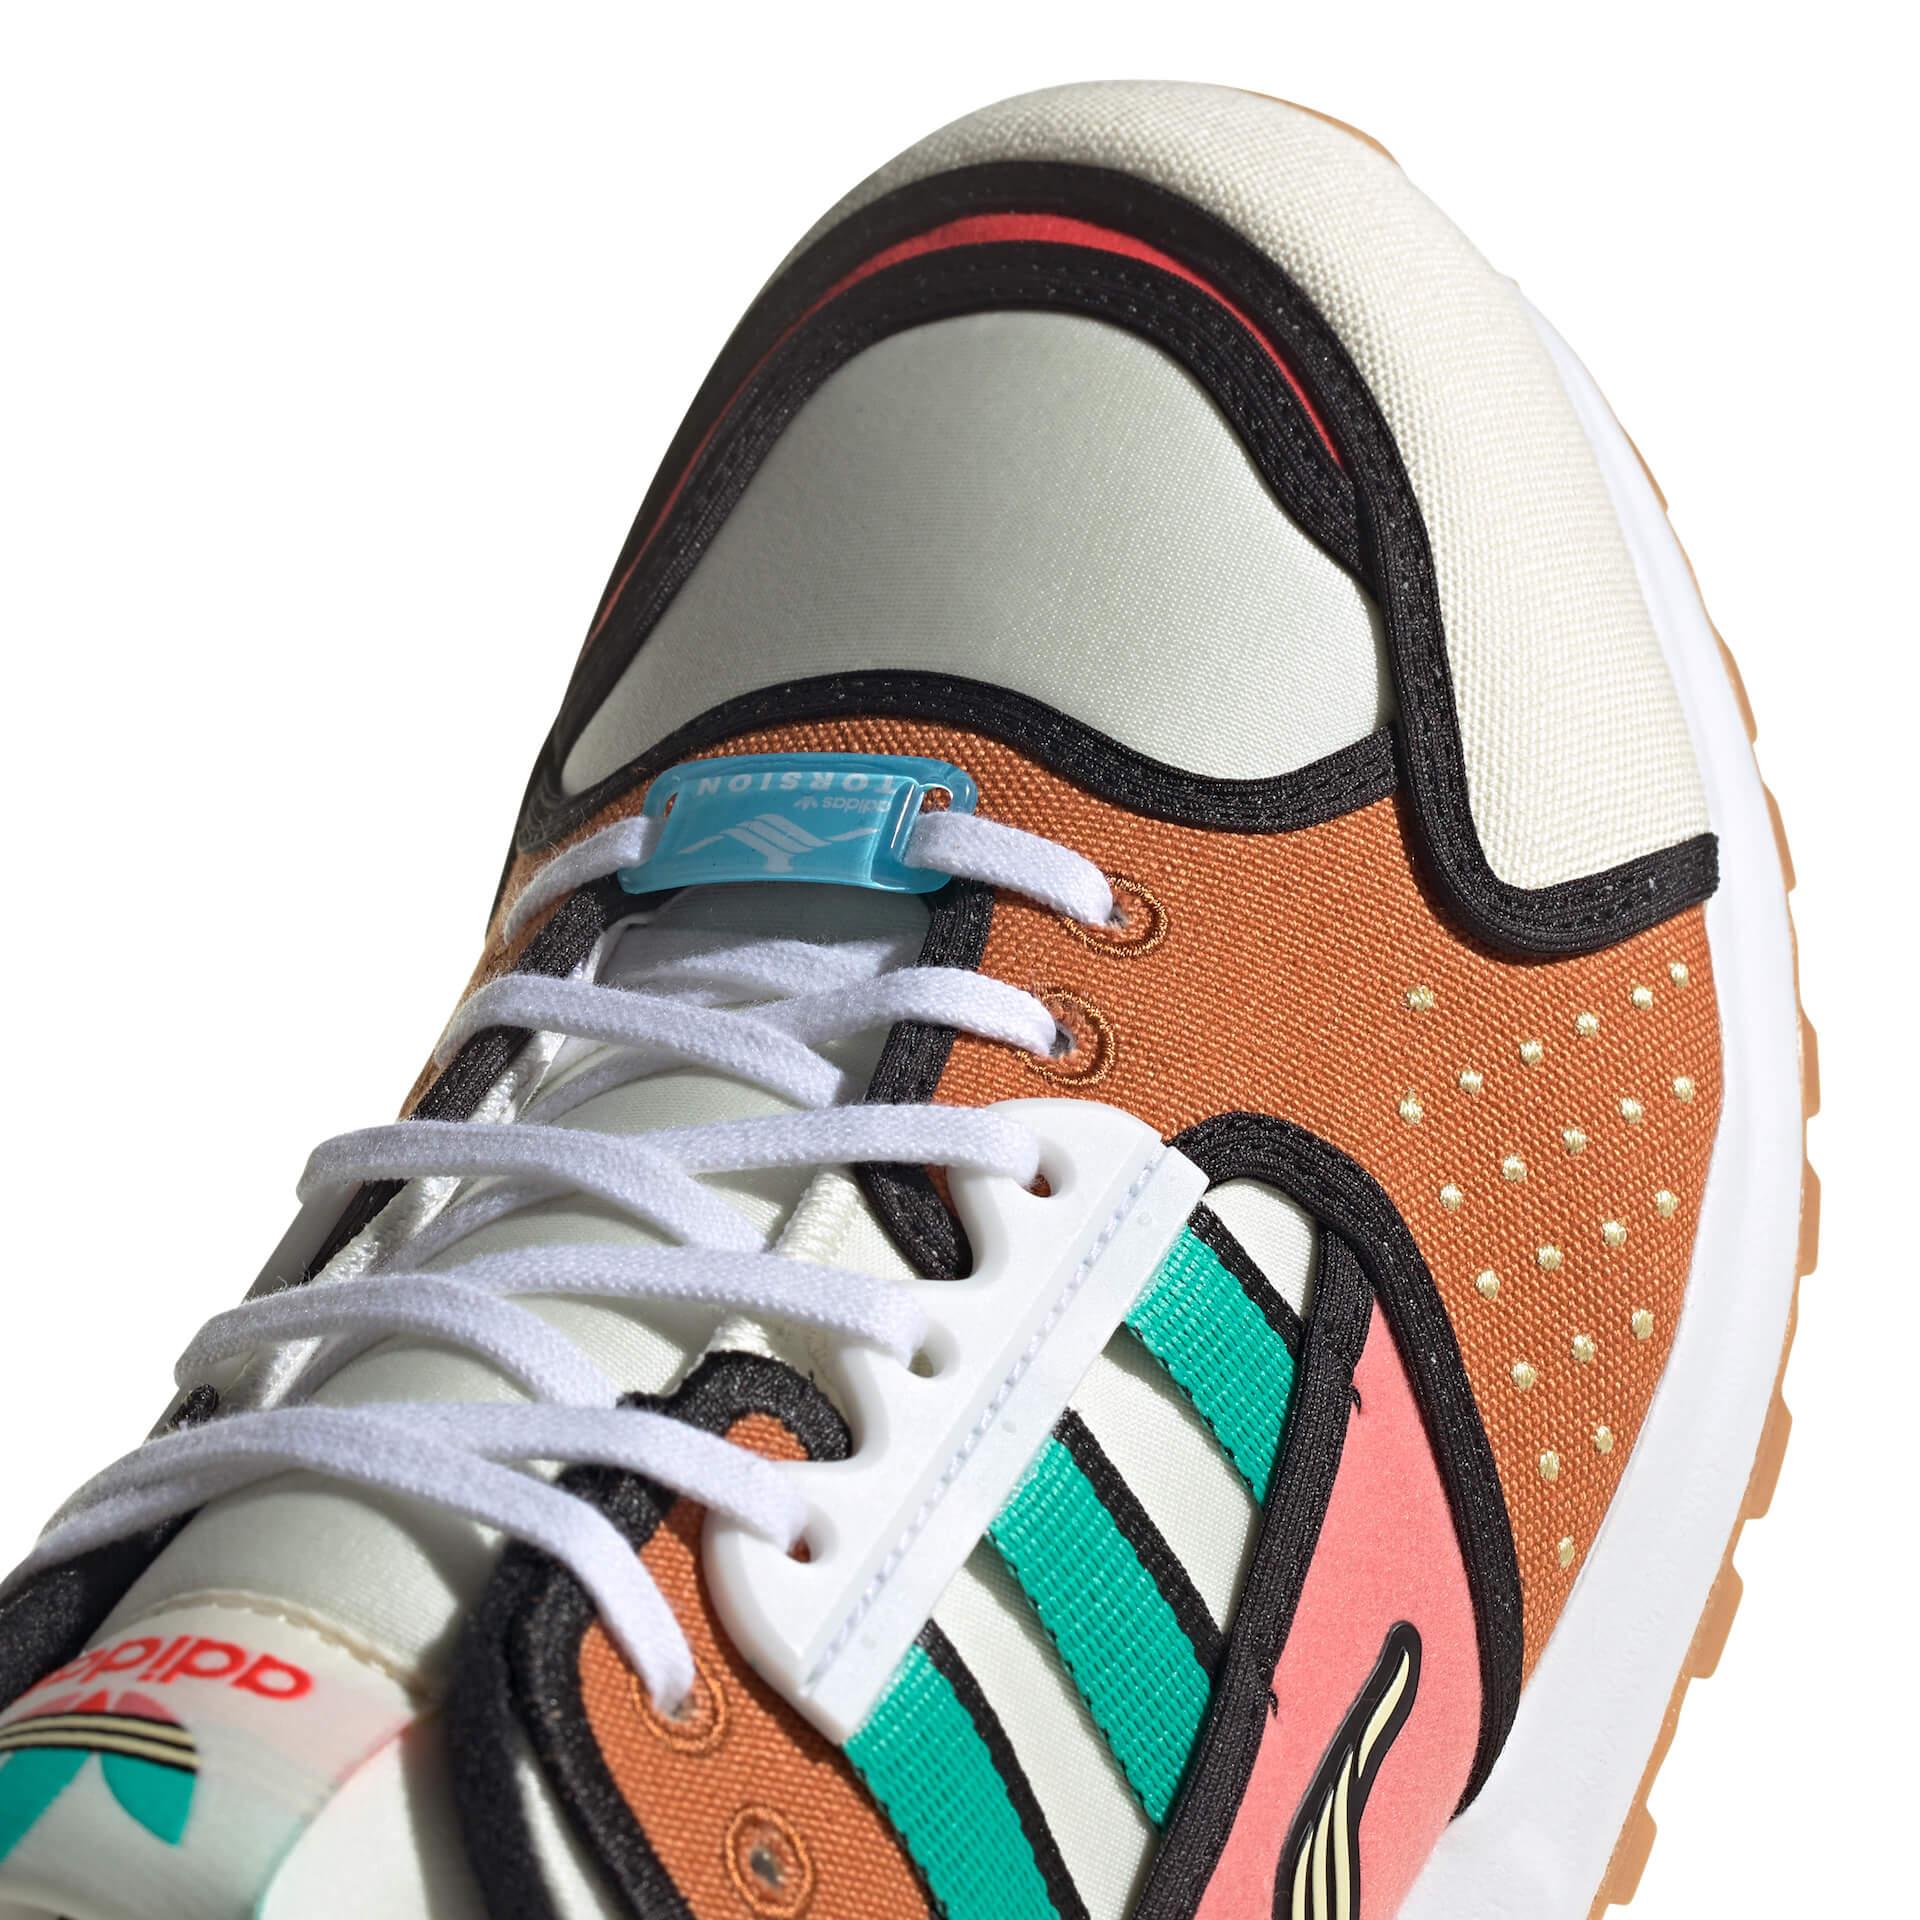 adidas Originals「A-ZX」シリーズにザ・シンプソンズKRUSTY BURGERをモチーフにしたモデルが登場!本日より販売開始 life210212_adidas_thesimpsons_10